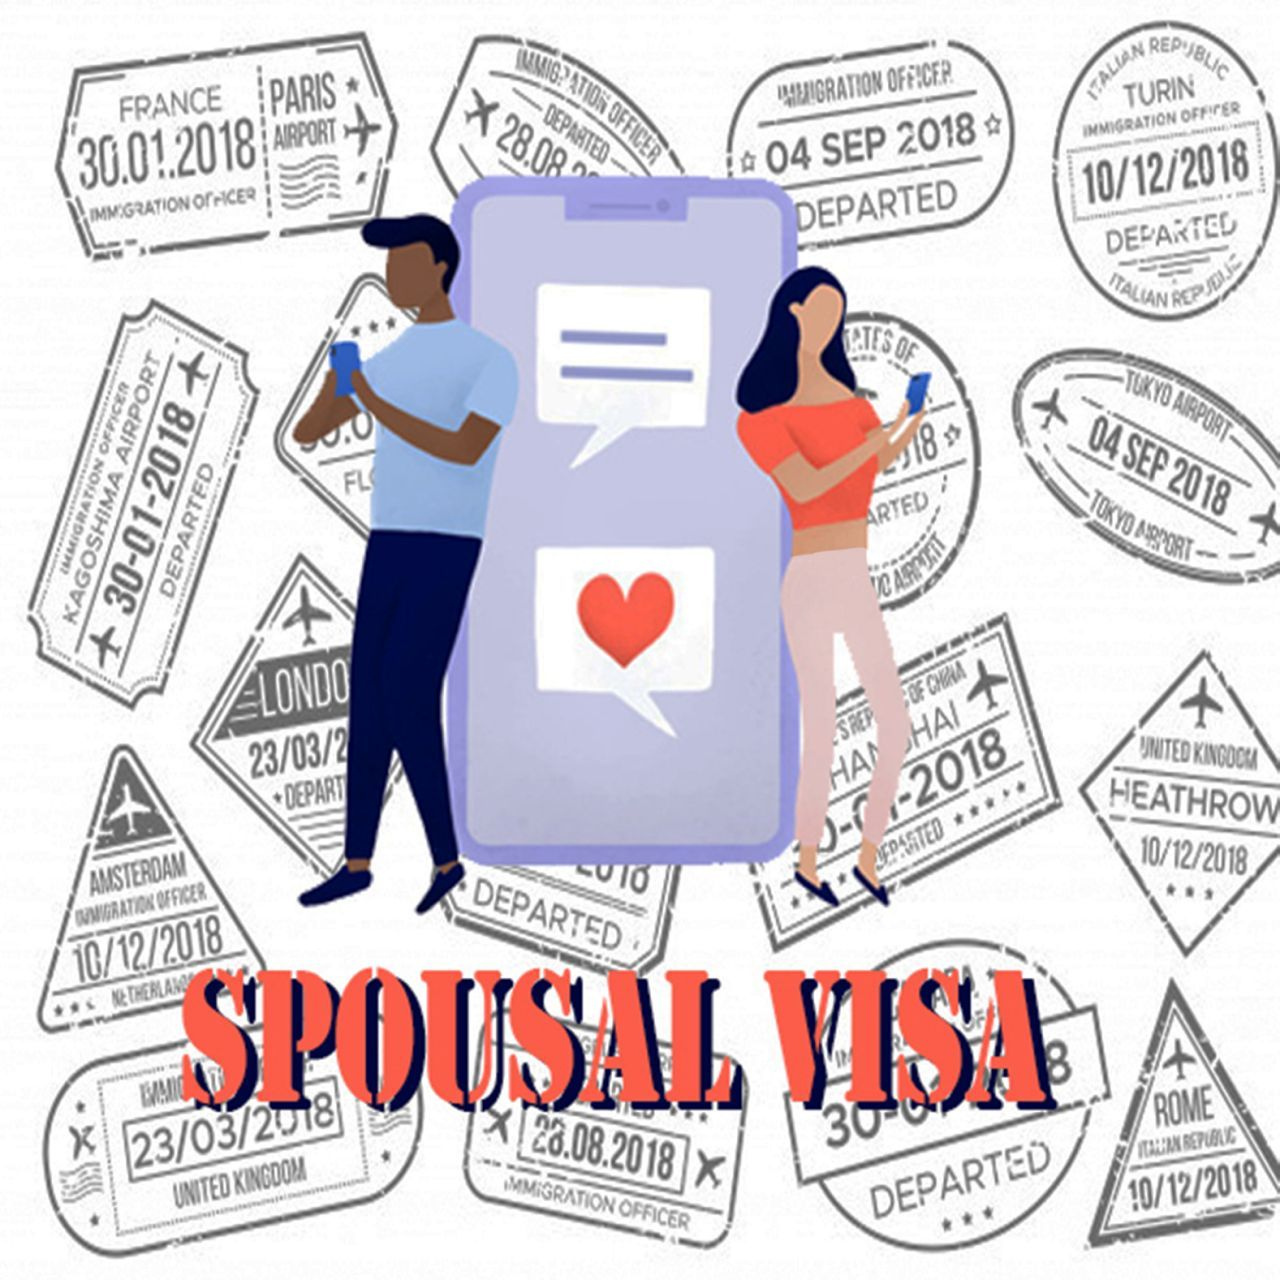 Spousal Visa Application Green Card Application Fiance Visa Visa